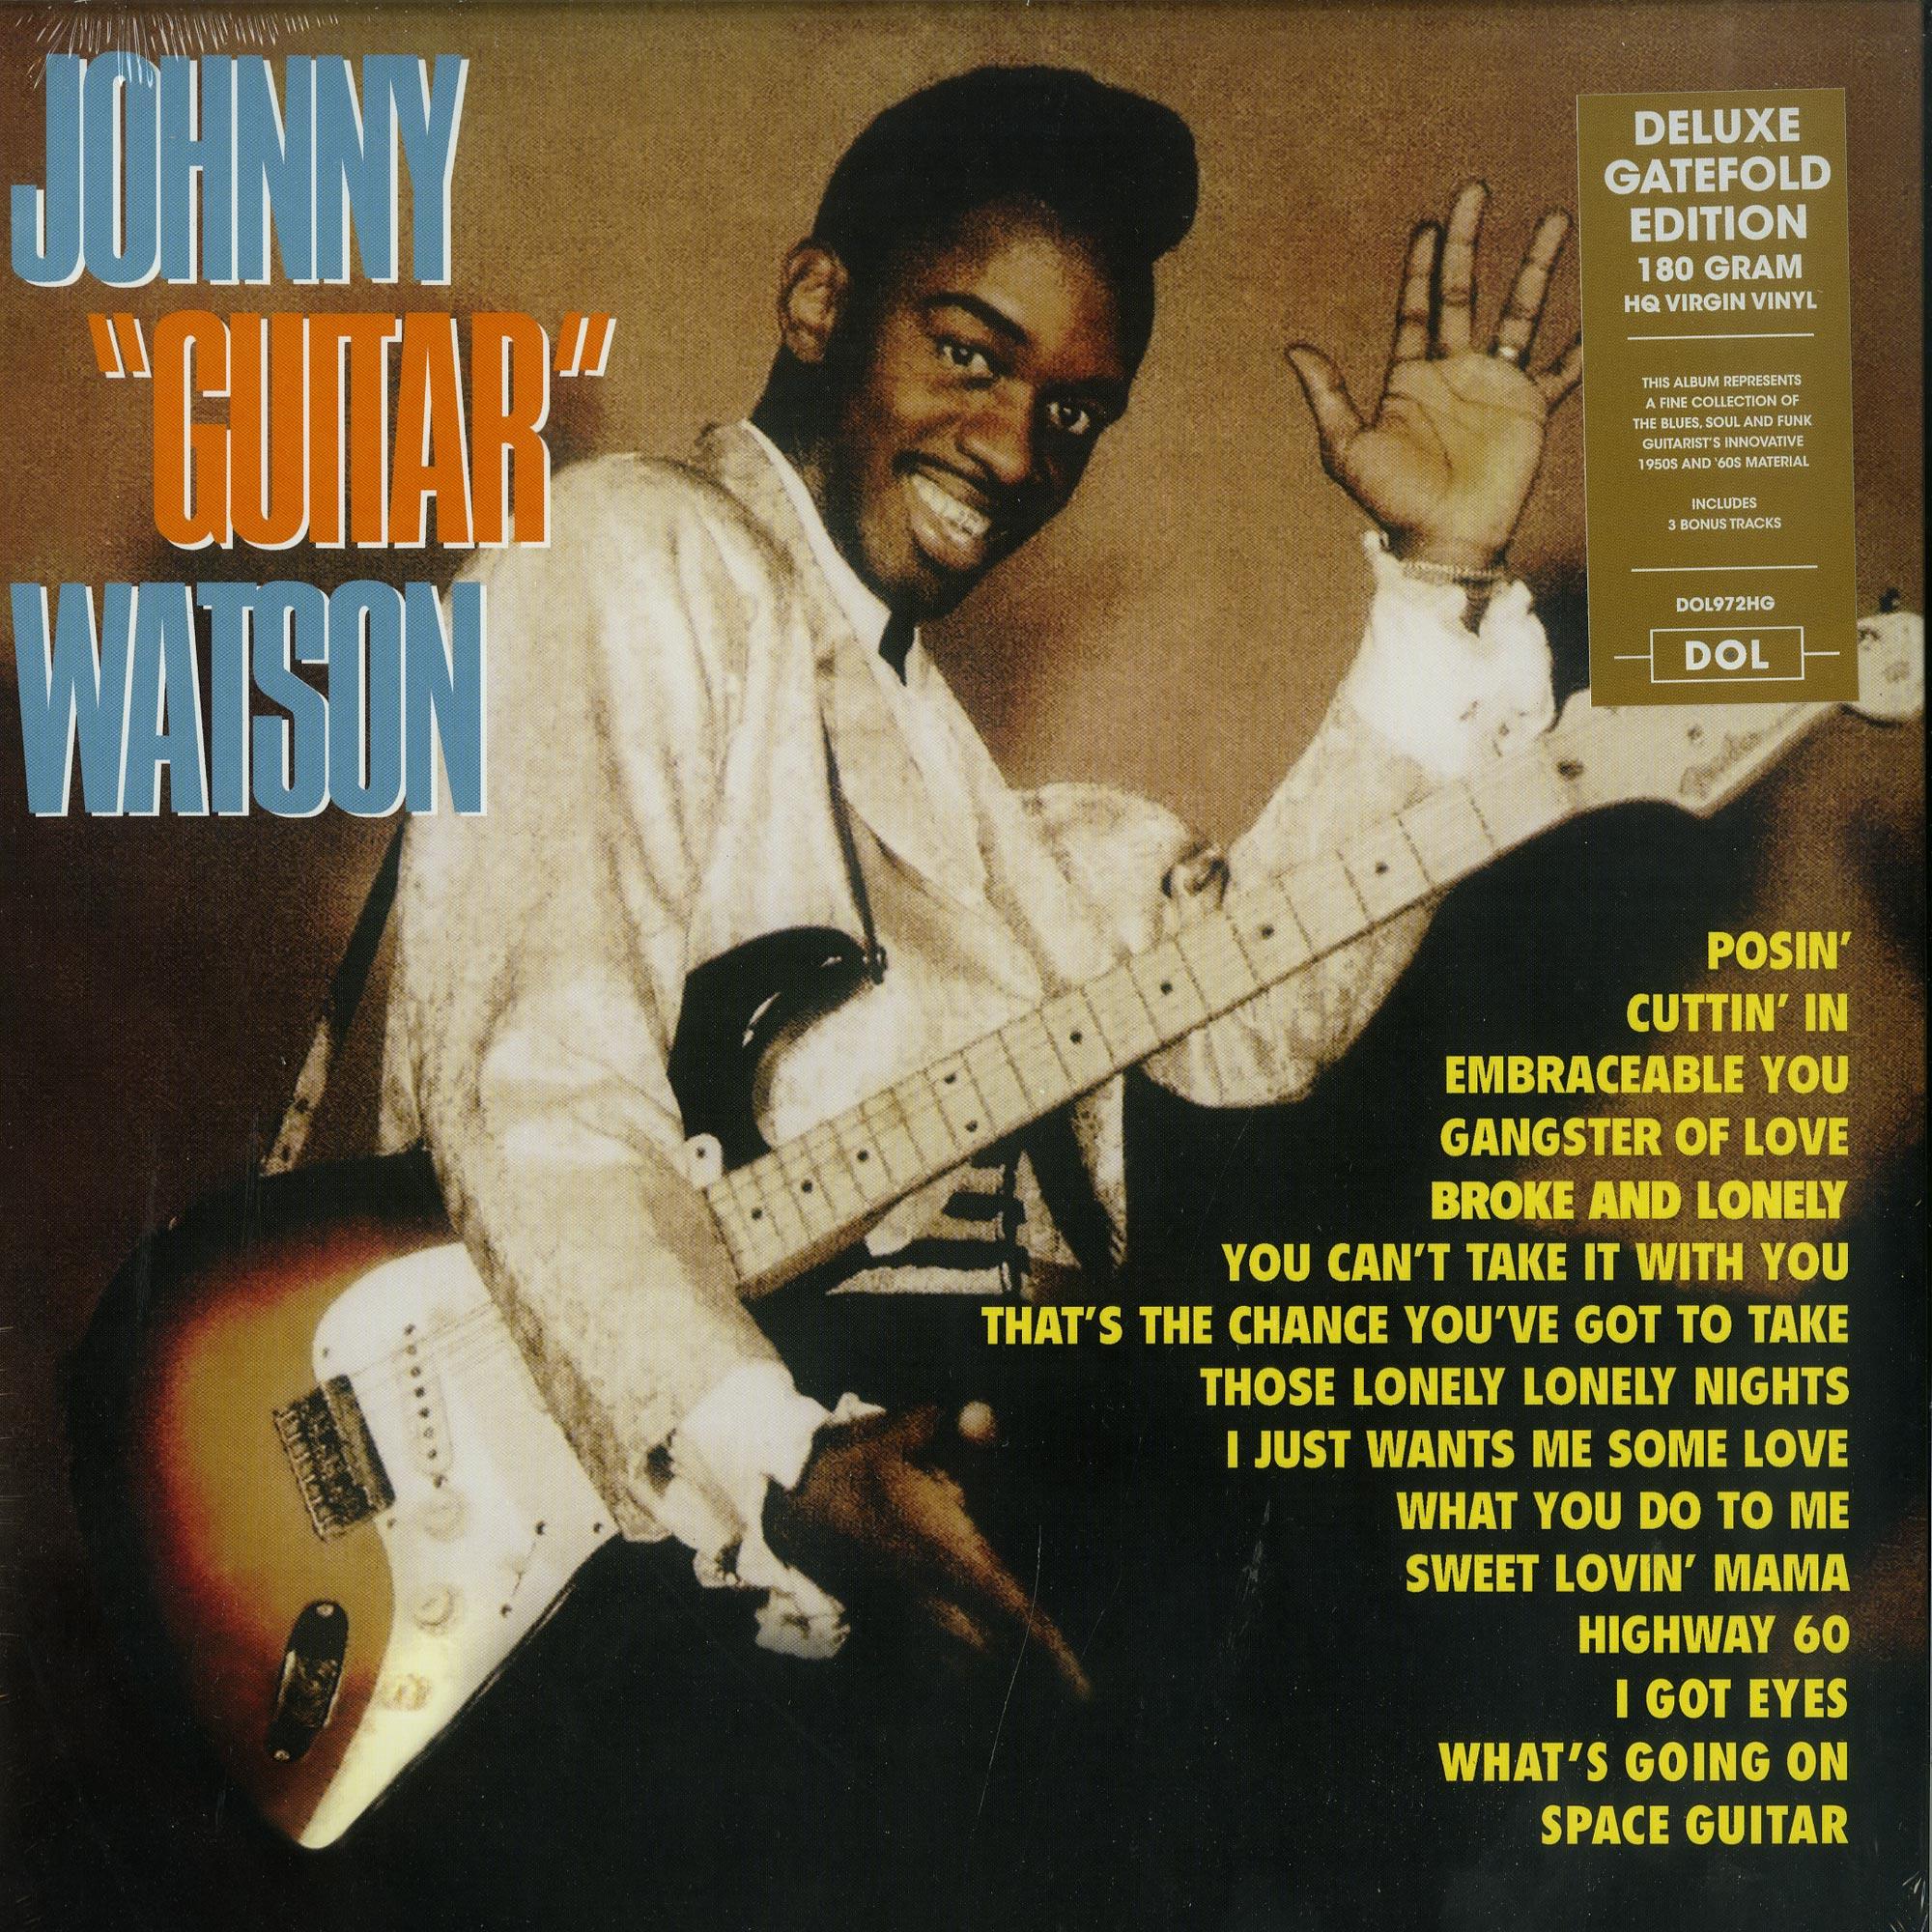 Johnny Guitar Watson - JOHNNY GUITAR WATSON